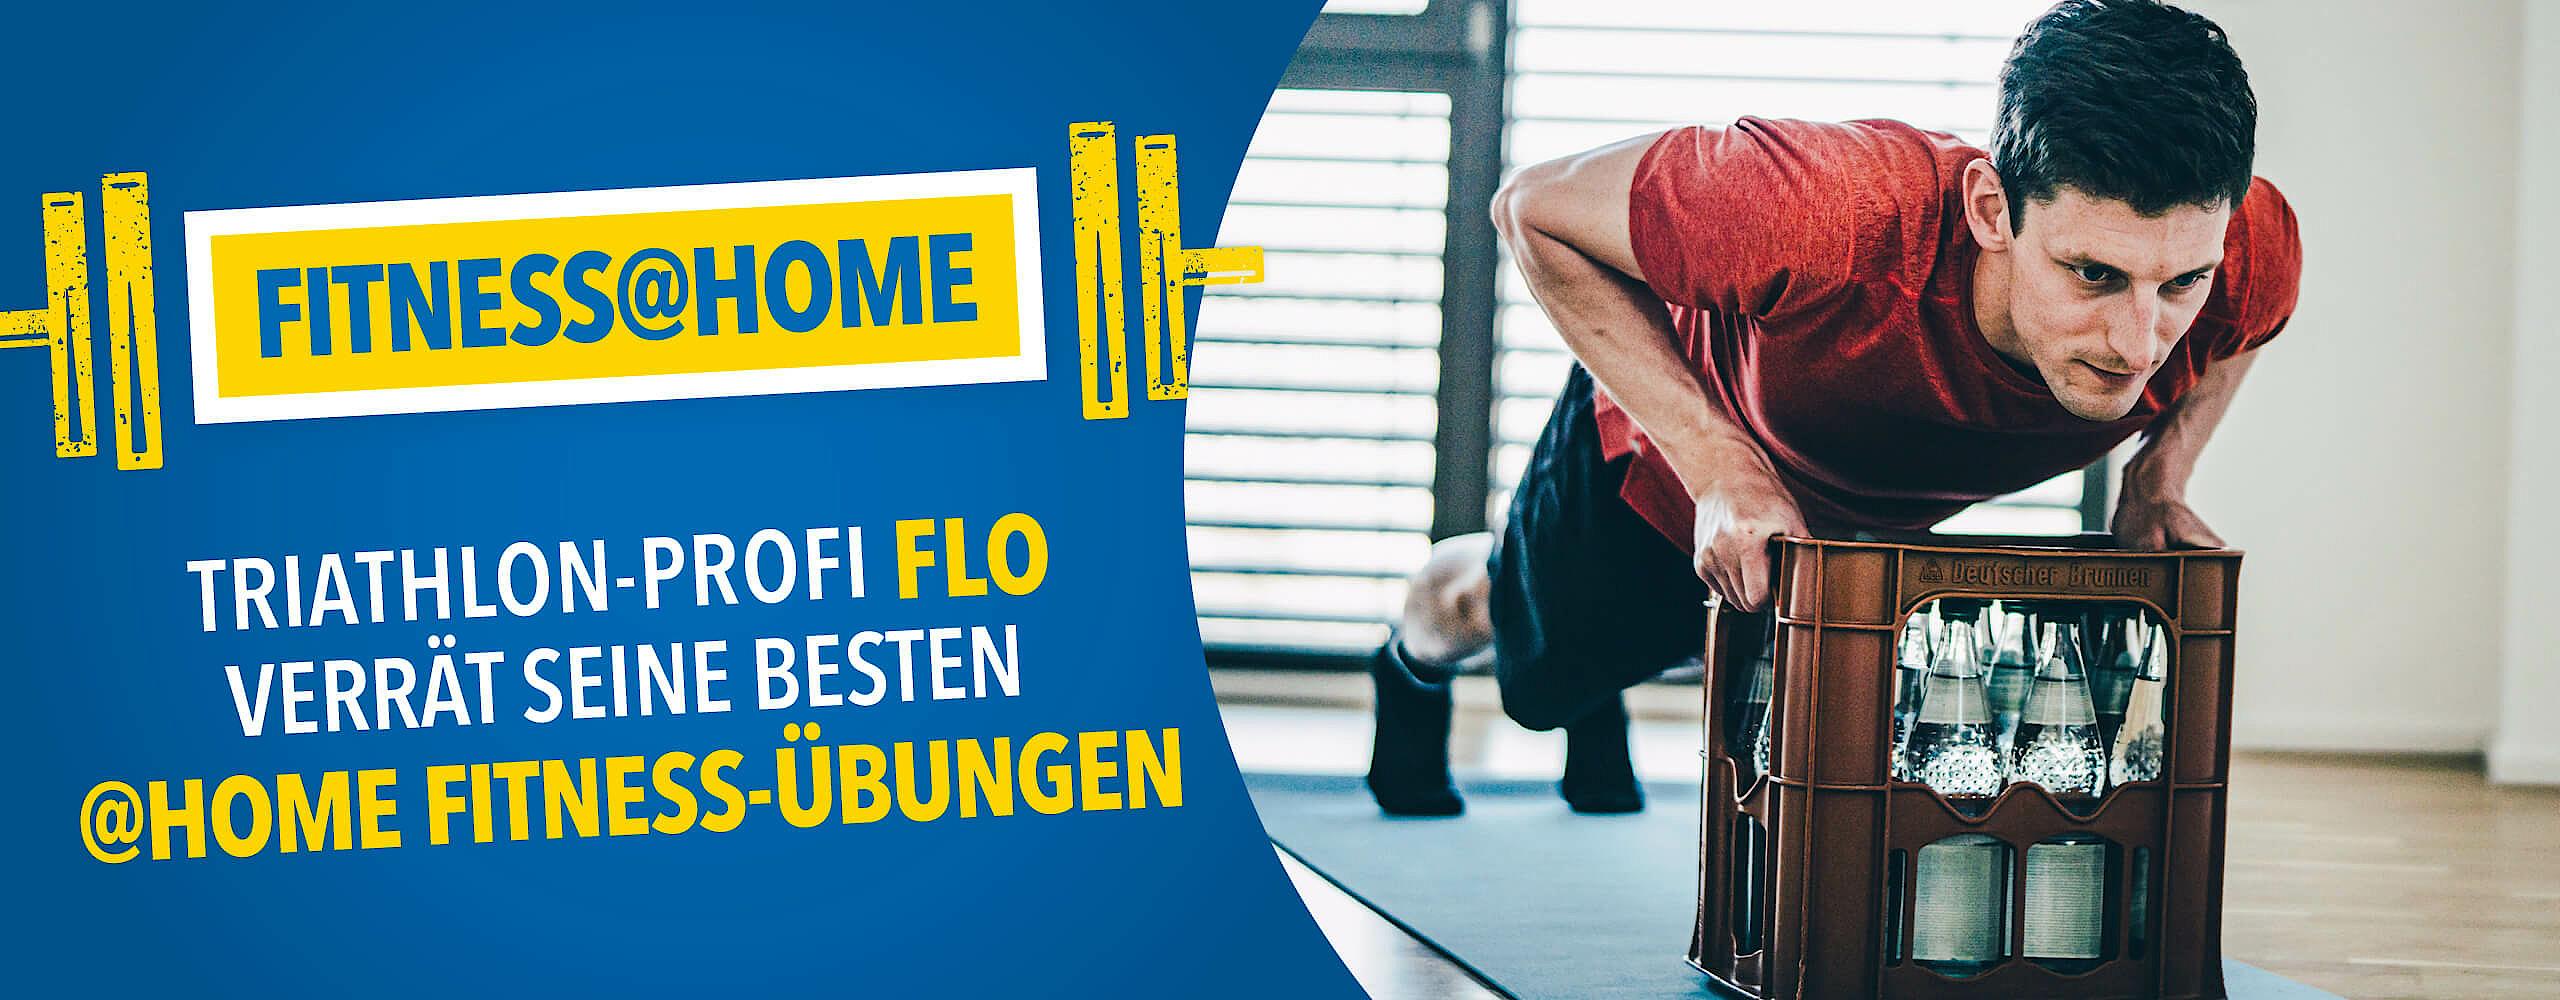 Fitness@home: Triathlon-Profi Florian Angert verrät seine besten @Home Fitness-Übungen